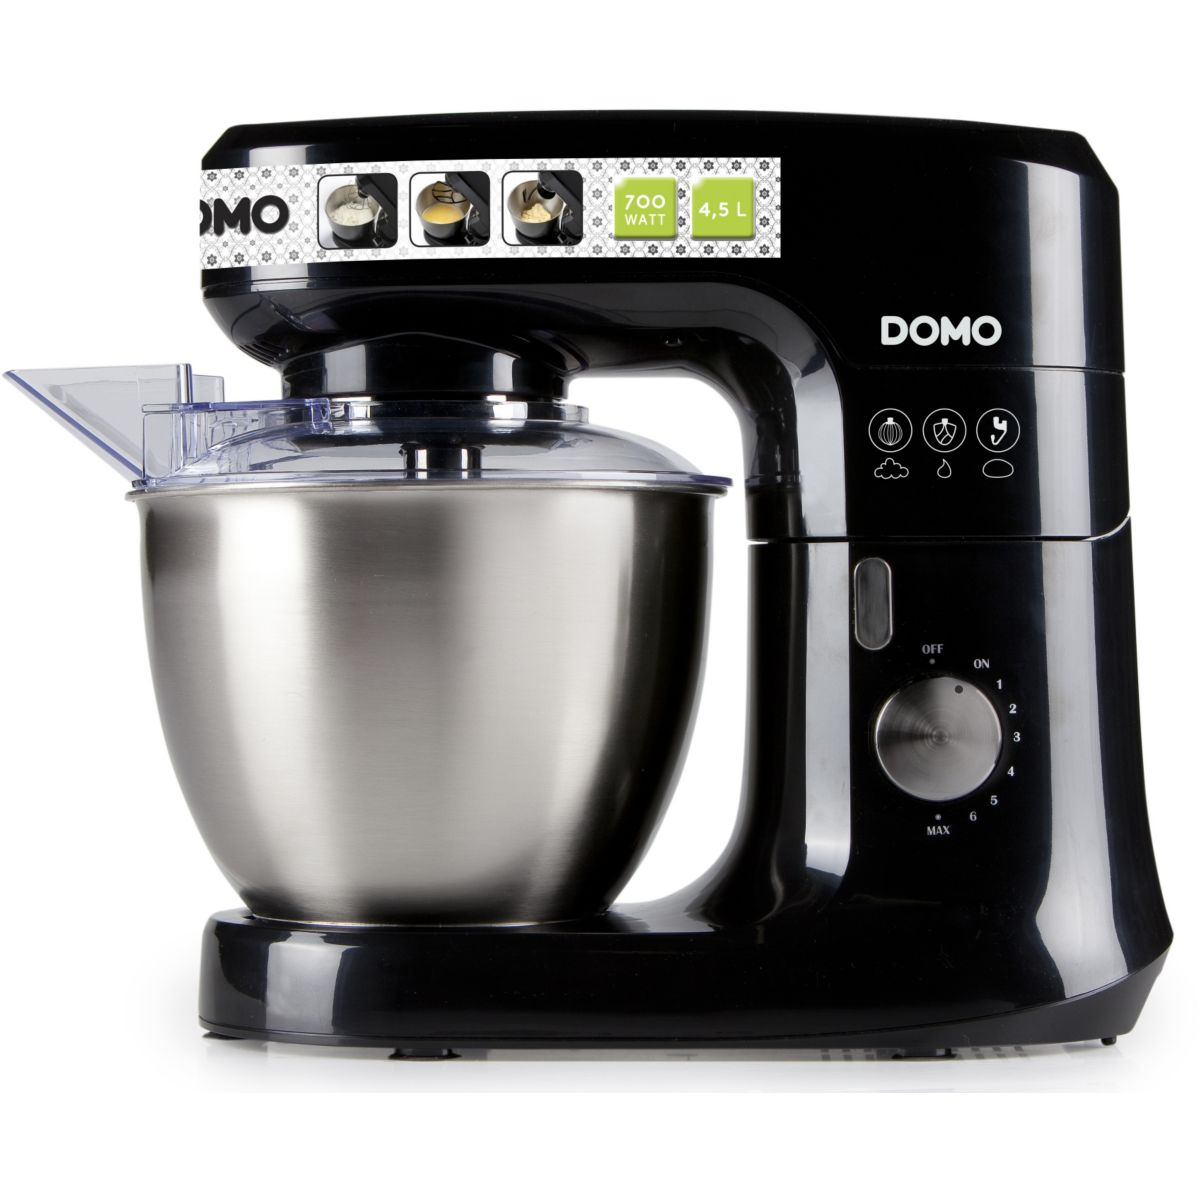 Domo do9111kr robot de cuisine comparer avec for Prix robot cuisine